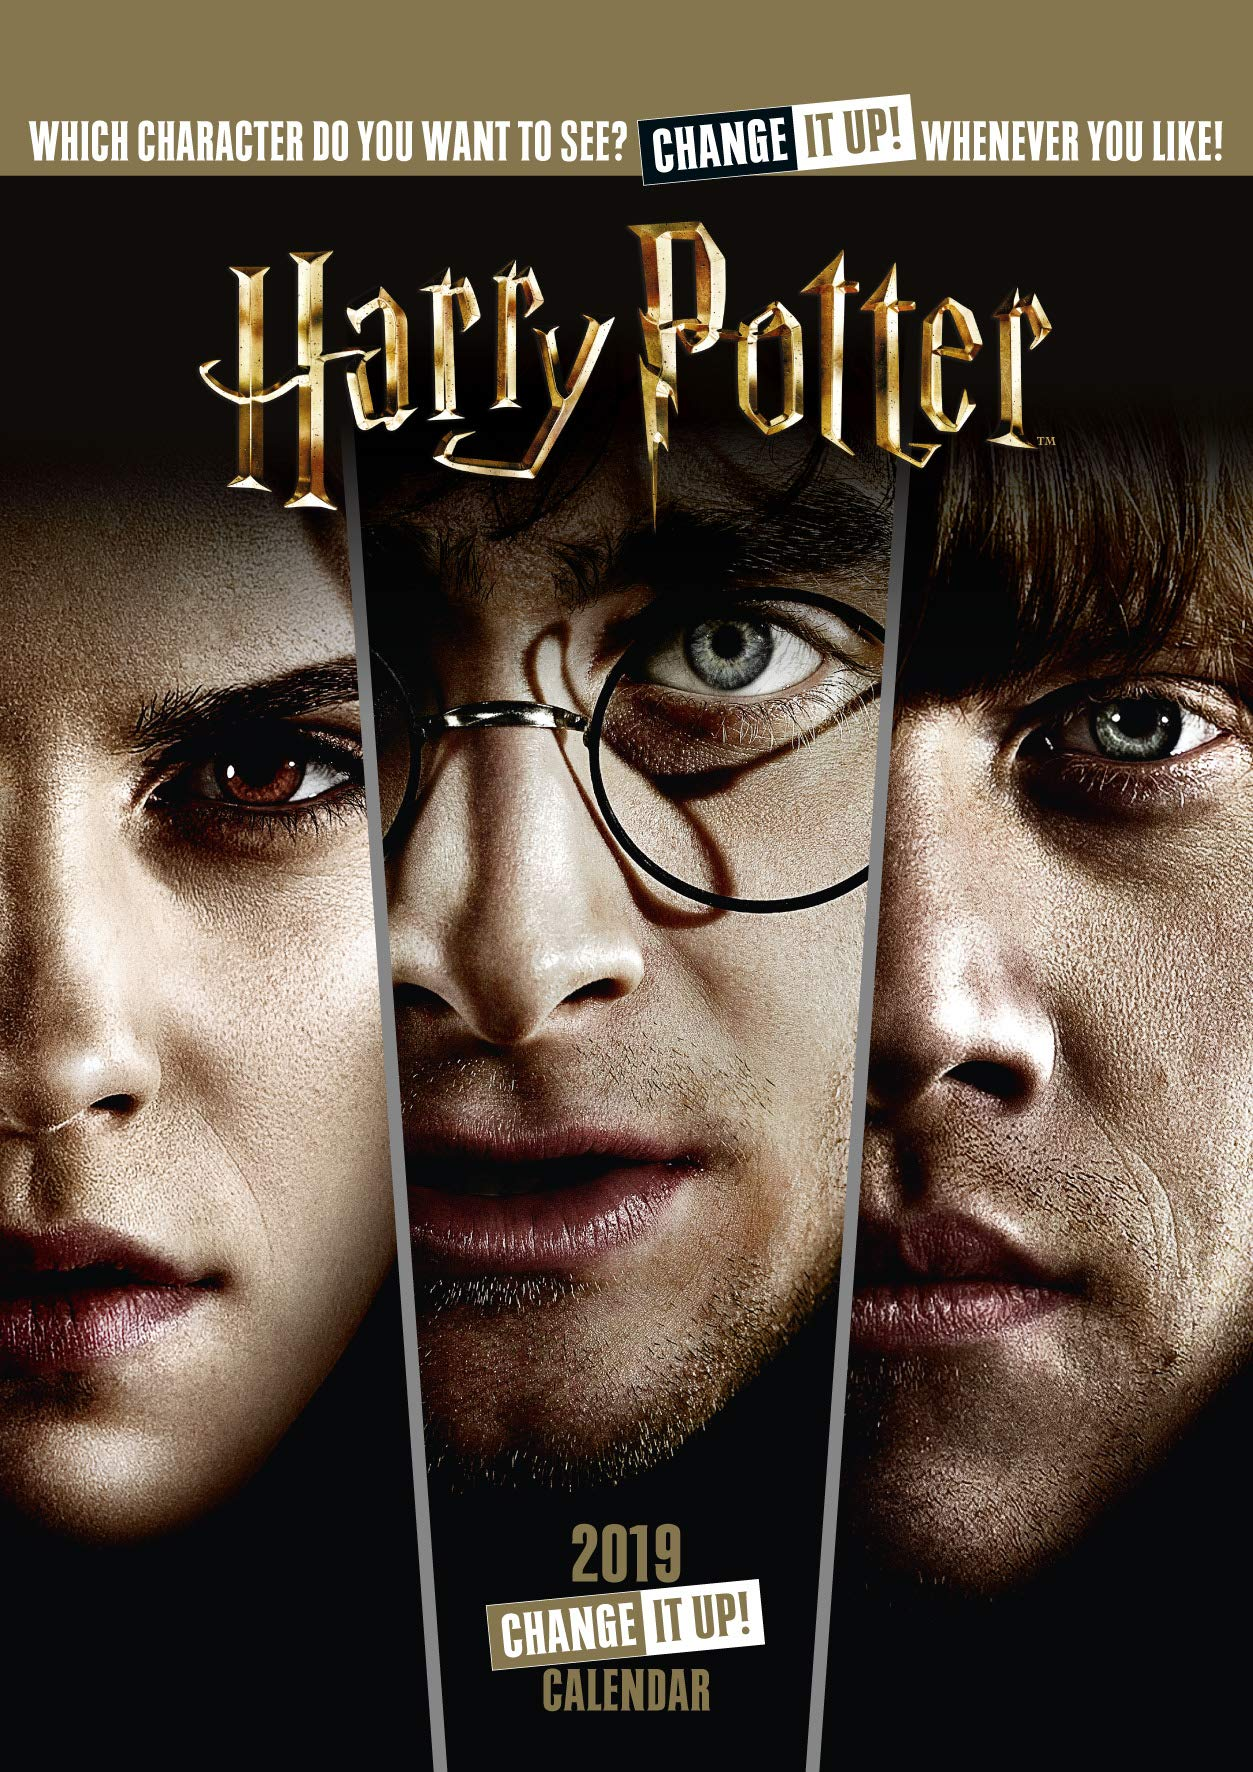 Harry Potter Official 2019 Calendar - A3 Change It Up Wall Calendar Format (Anglais) Calendrier – Calendrier mural, 15 septembre 2018 Danilo Promotions Limited 1785498592 NON-CLASSIFIABLE Address Books